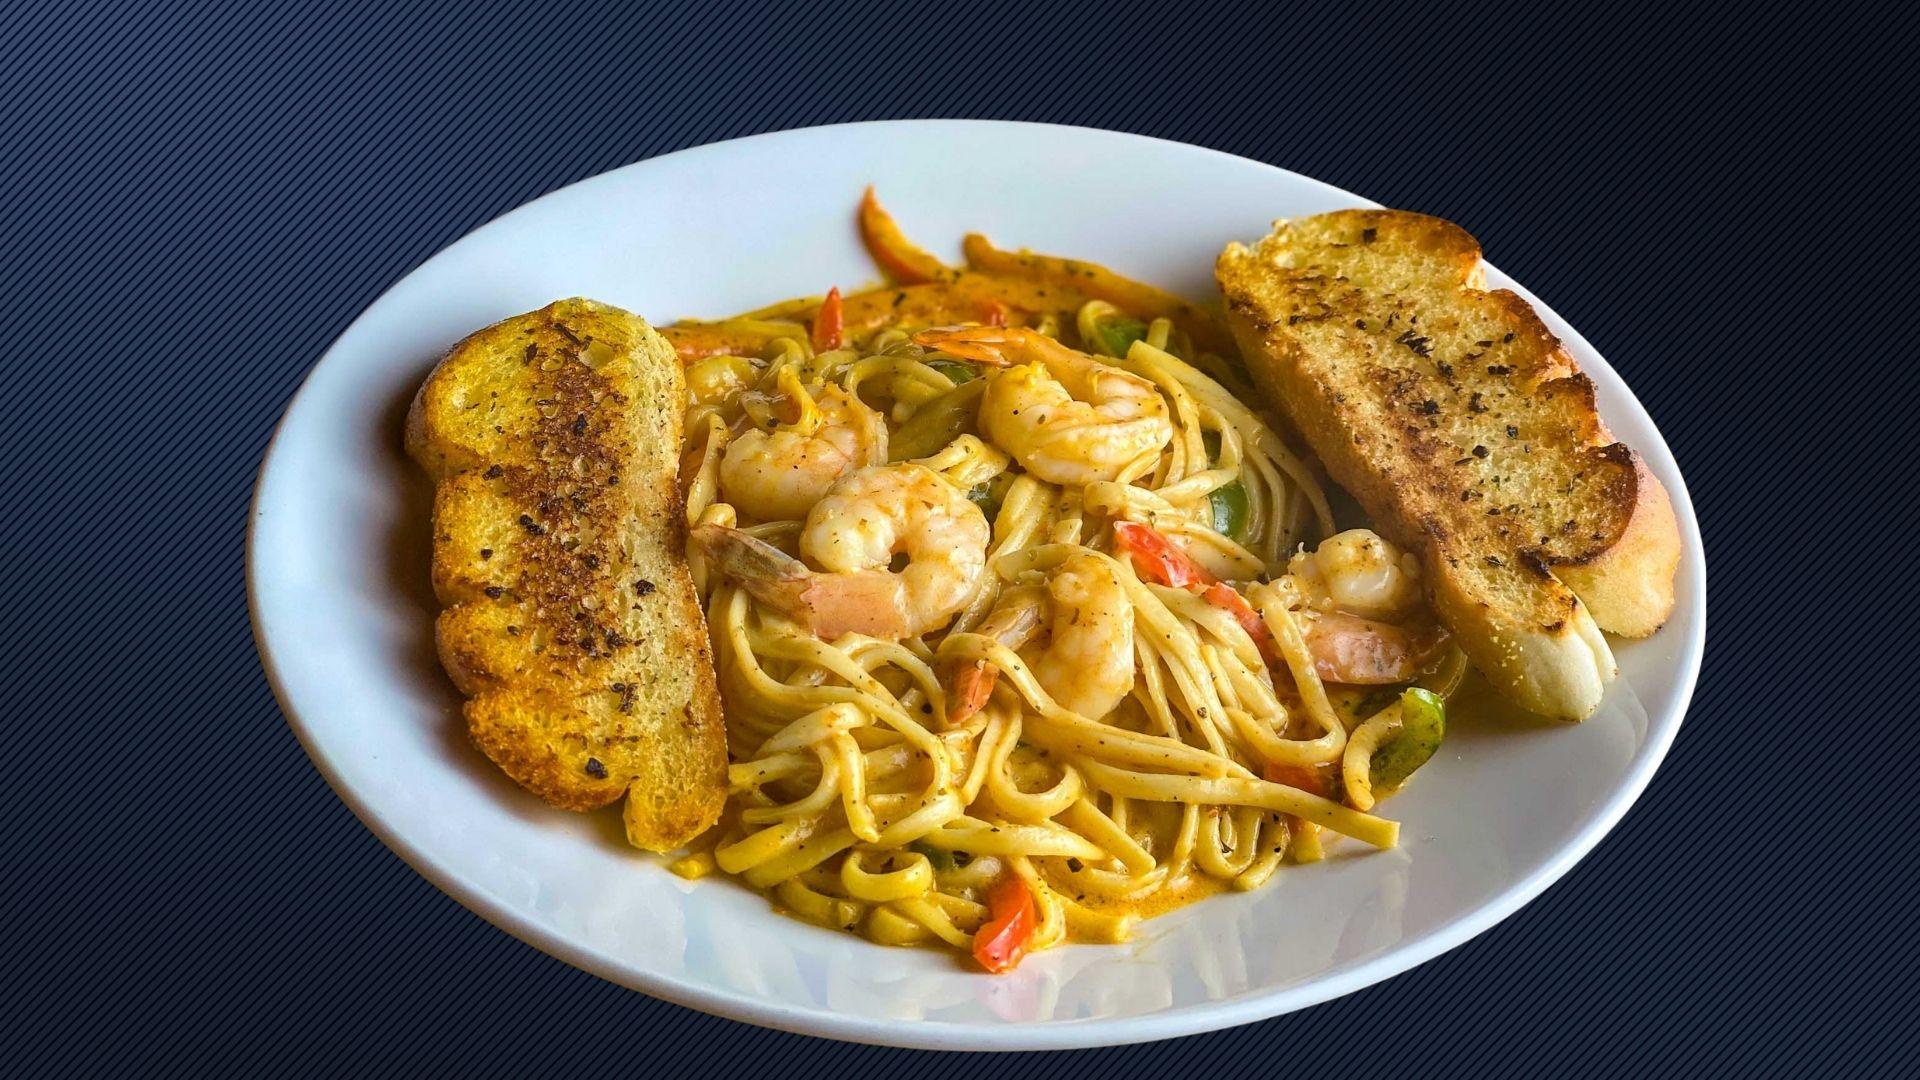 Pier53 - Cajun Shrimp Linguine